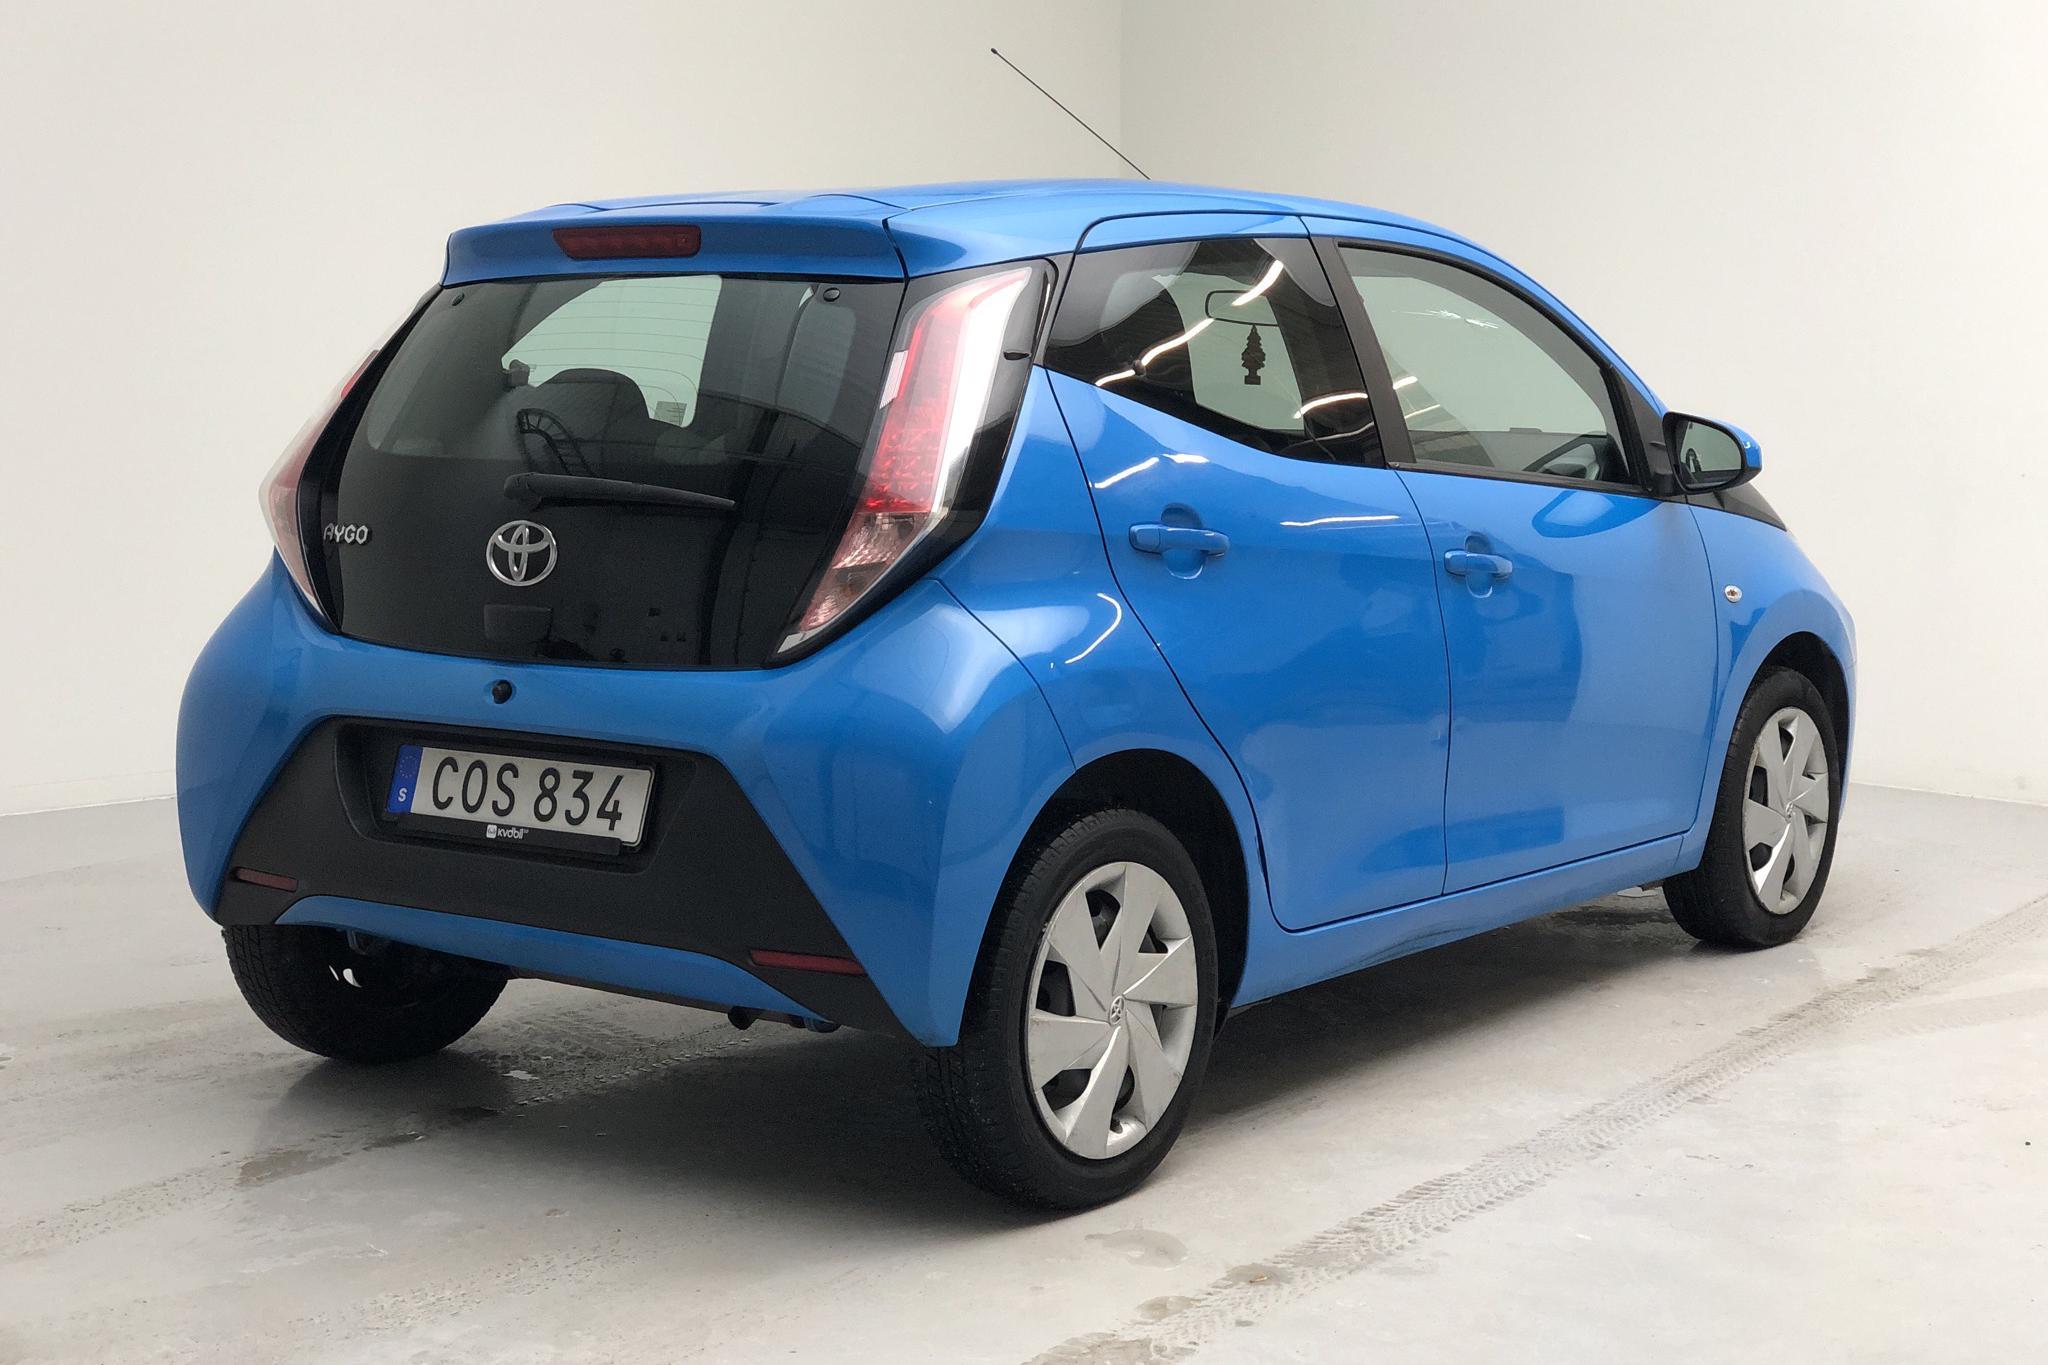 Toyota Aygo 1.0 5dr (69hk) - 91 060 km - Automatic - blue - 2018